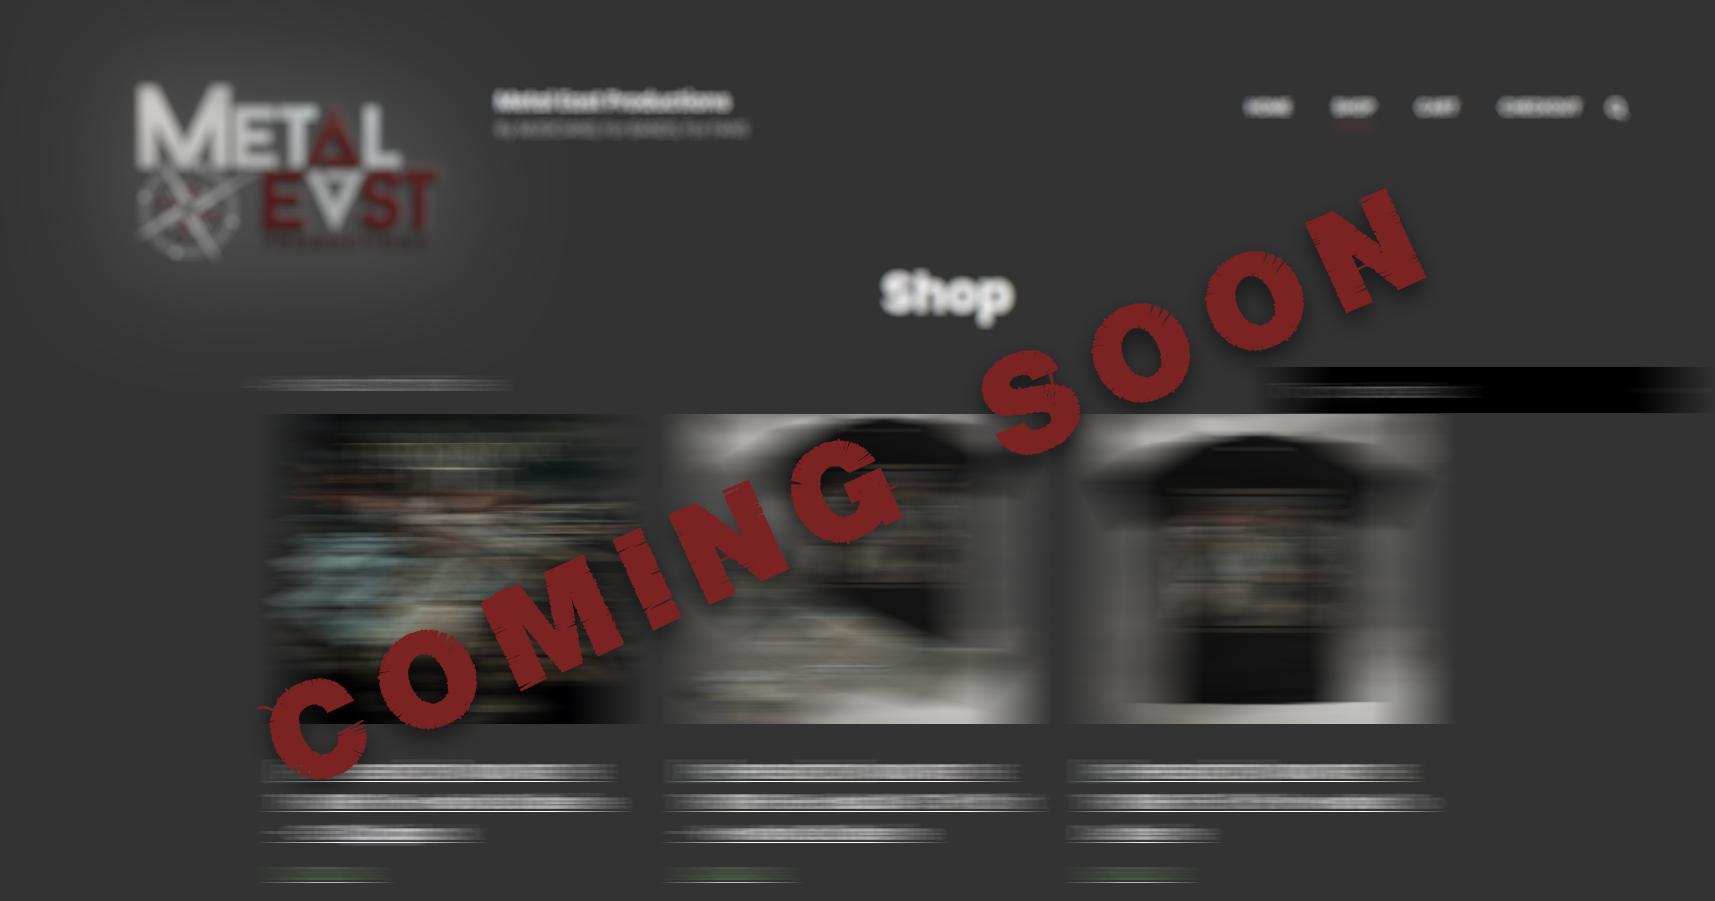 Shop - Coming Soon...